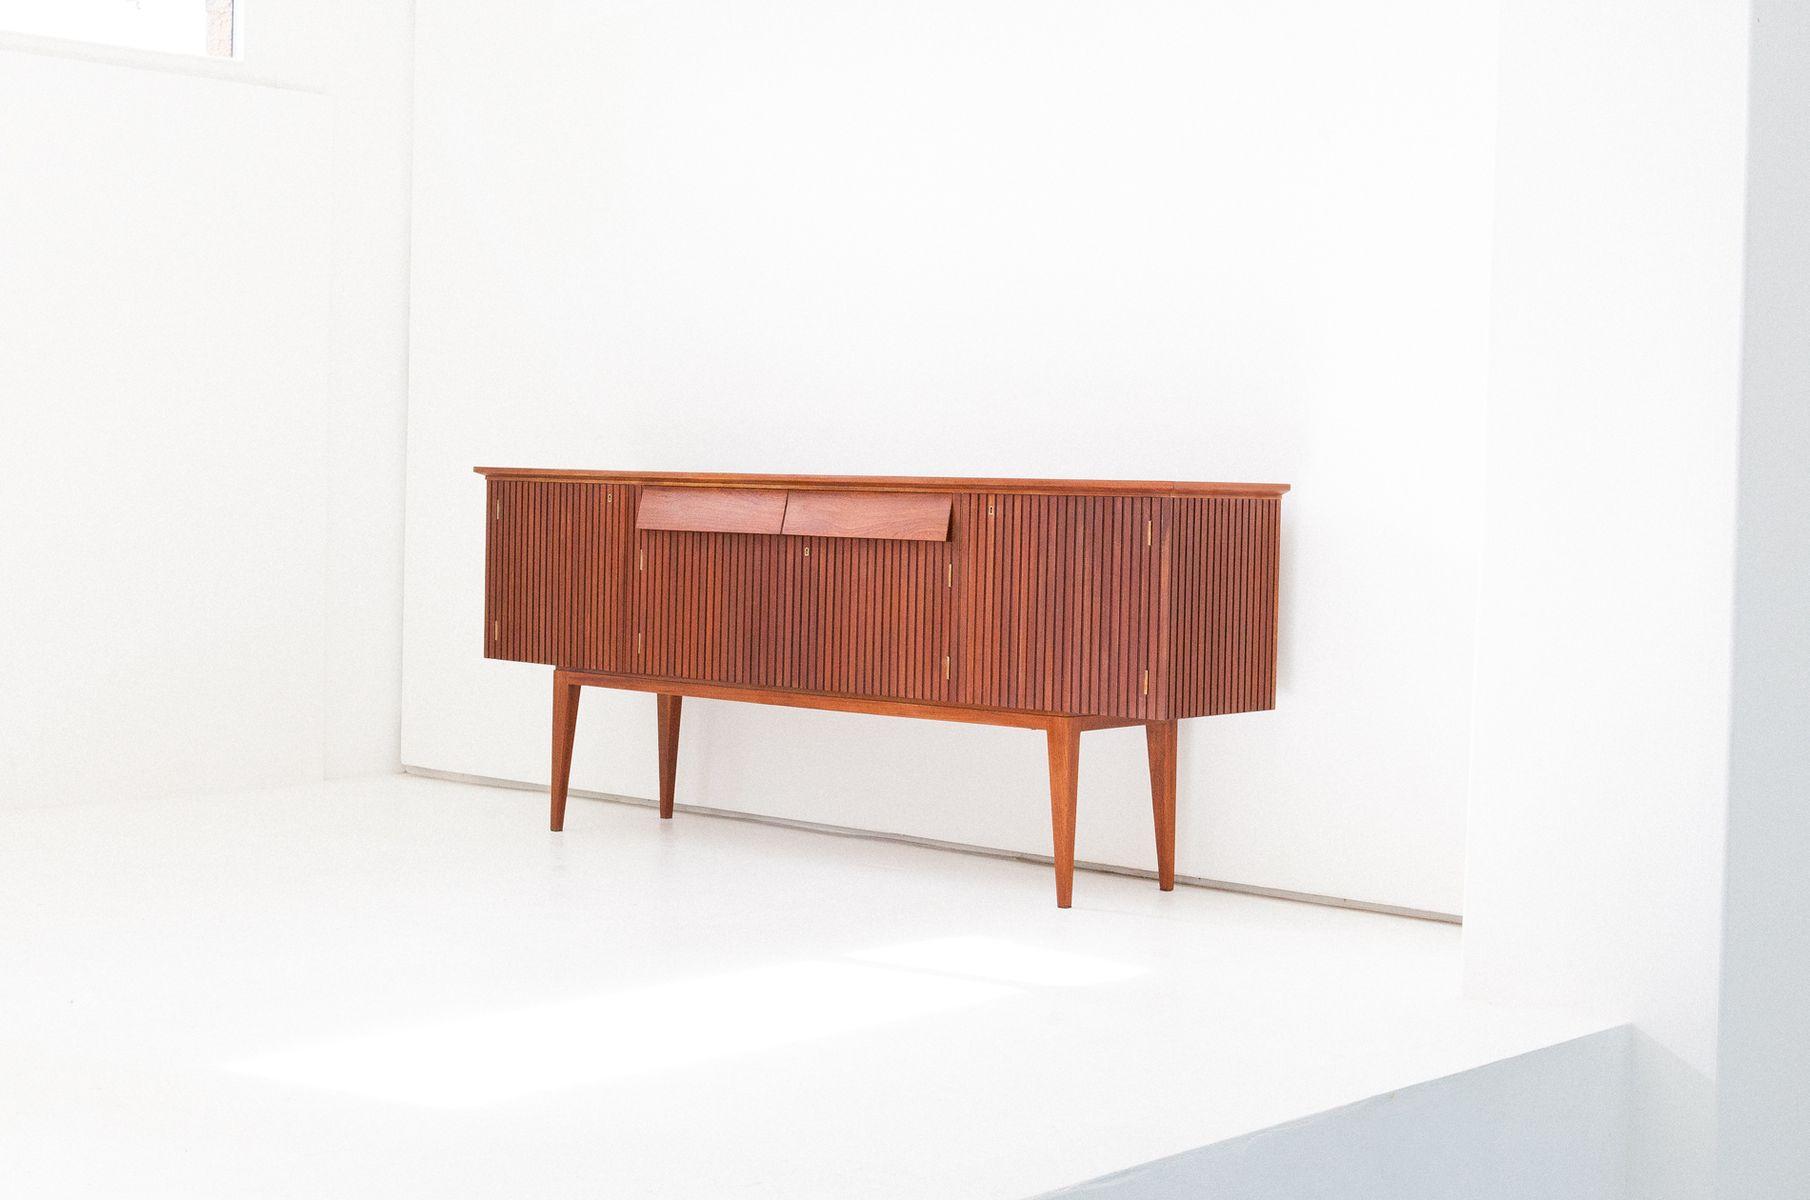 italienisches mid century mahagoni sideboard 1950er bei pamono kaufen. Black Bedroom Furniture Sets. Home Design Ideas